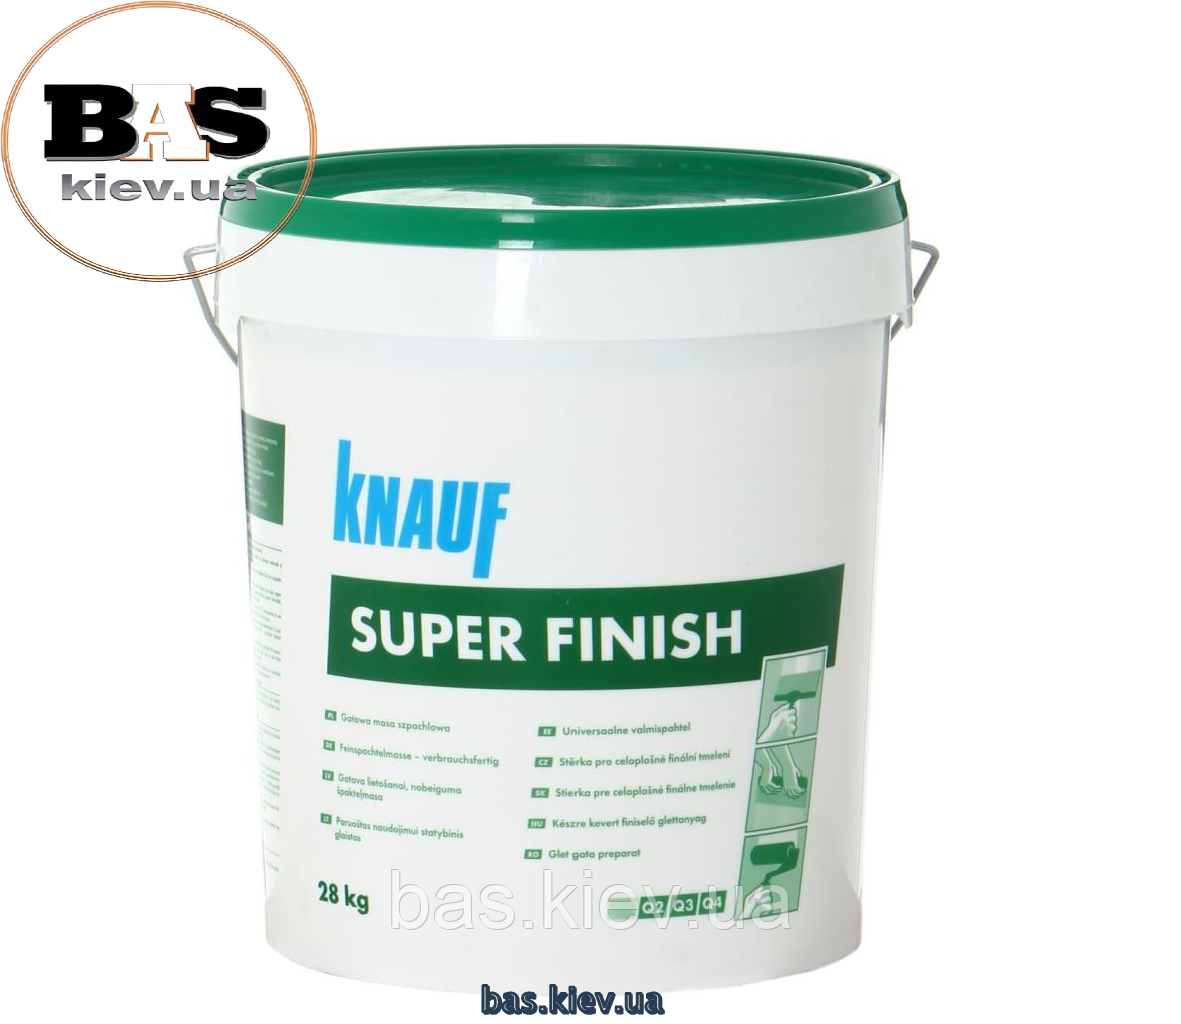 Шпаклевка Knauf Super Finish (Sheetrock), 28 kg